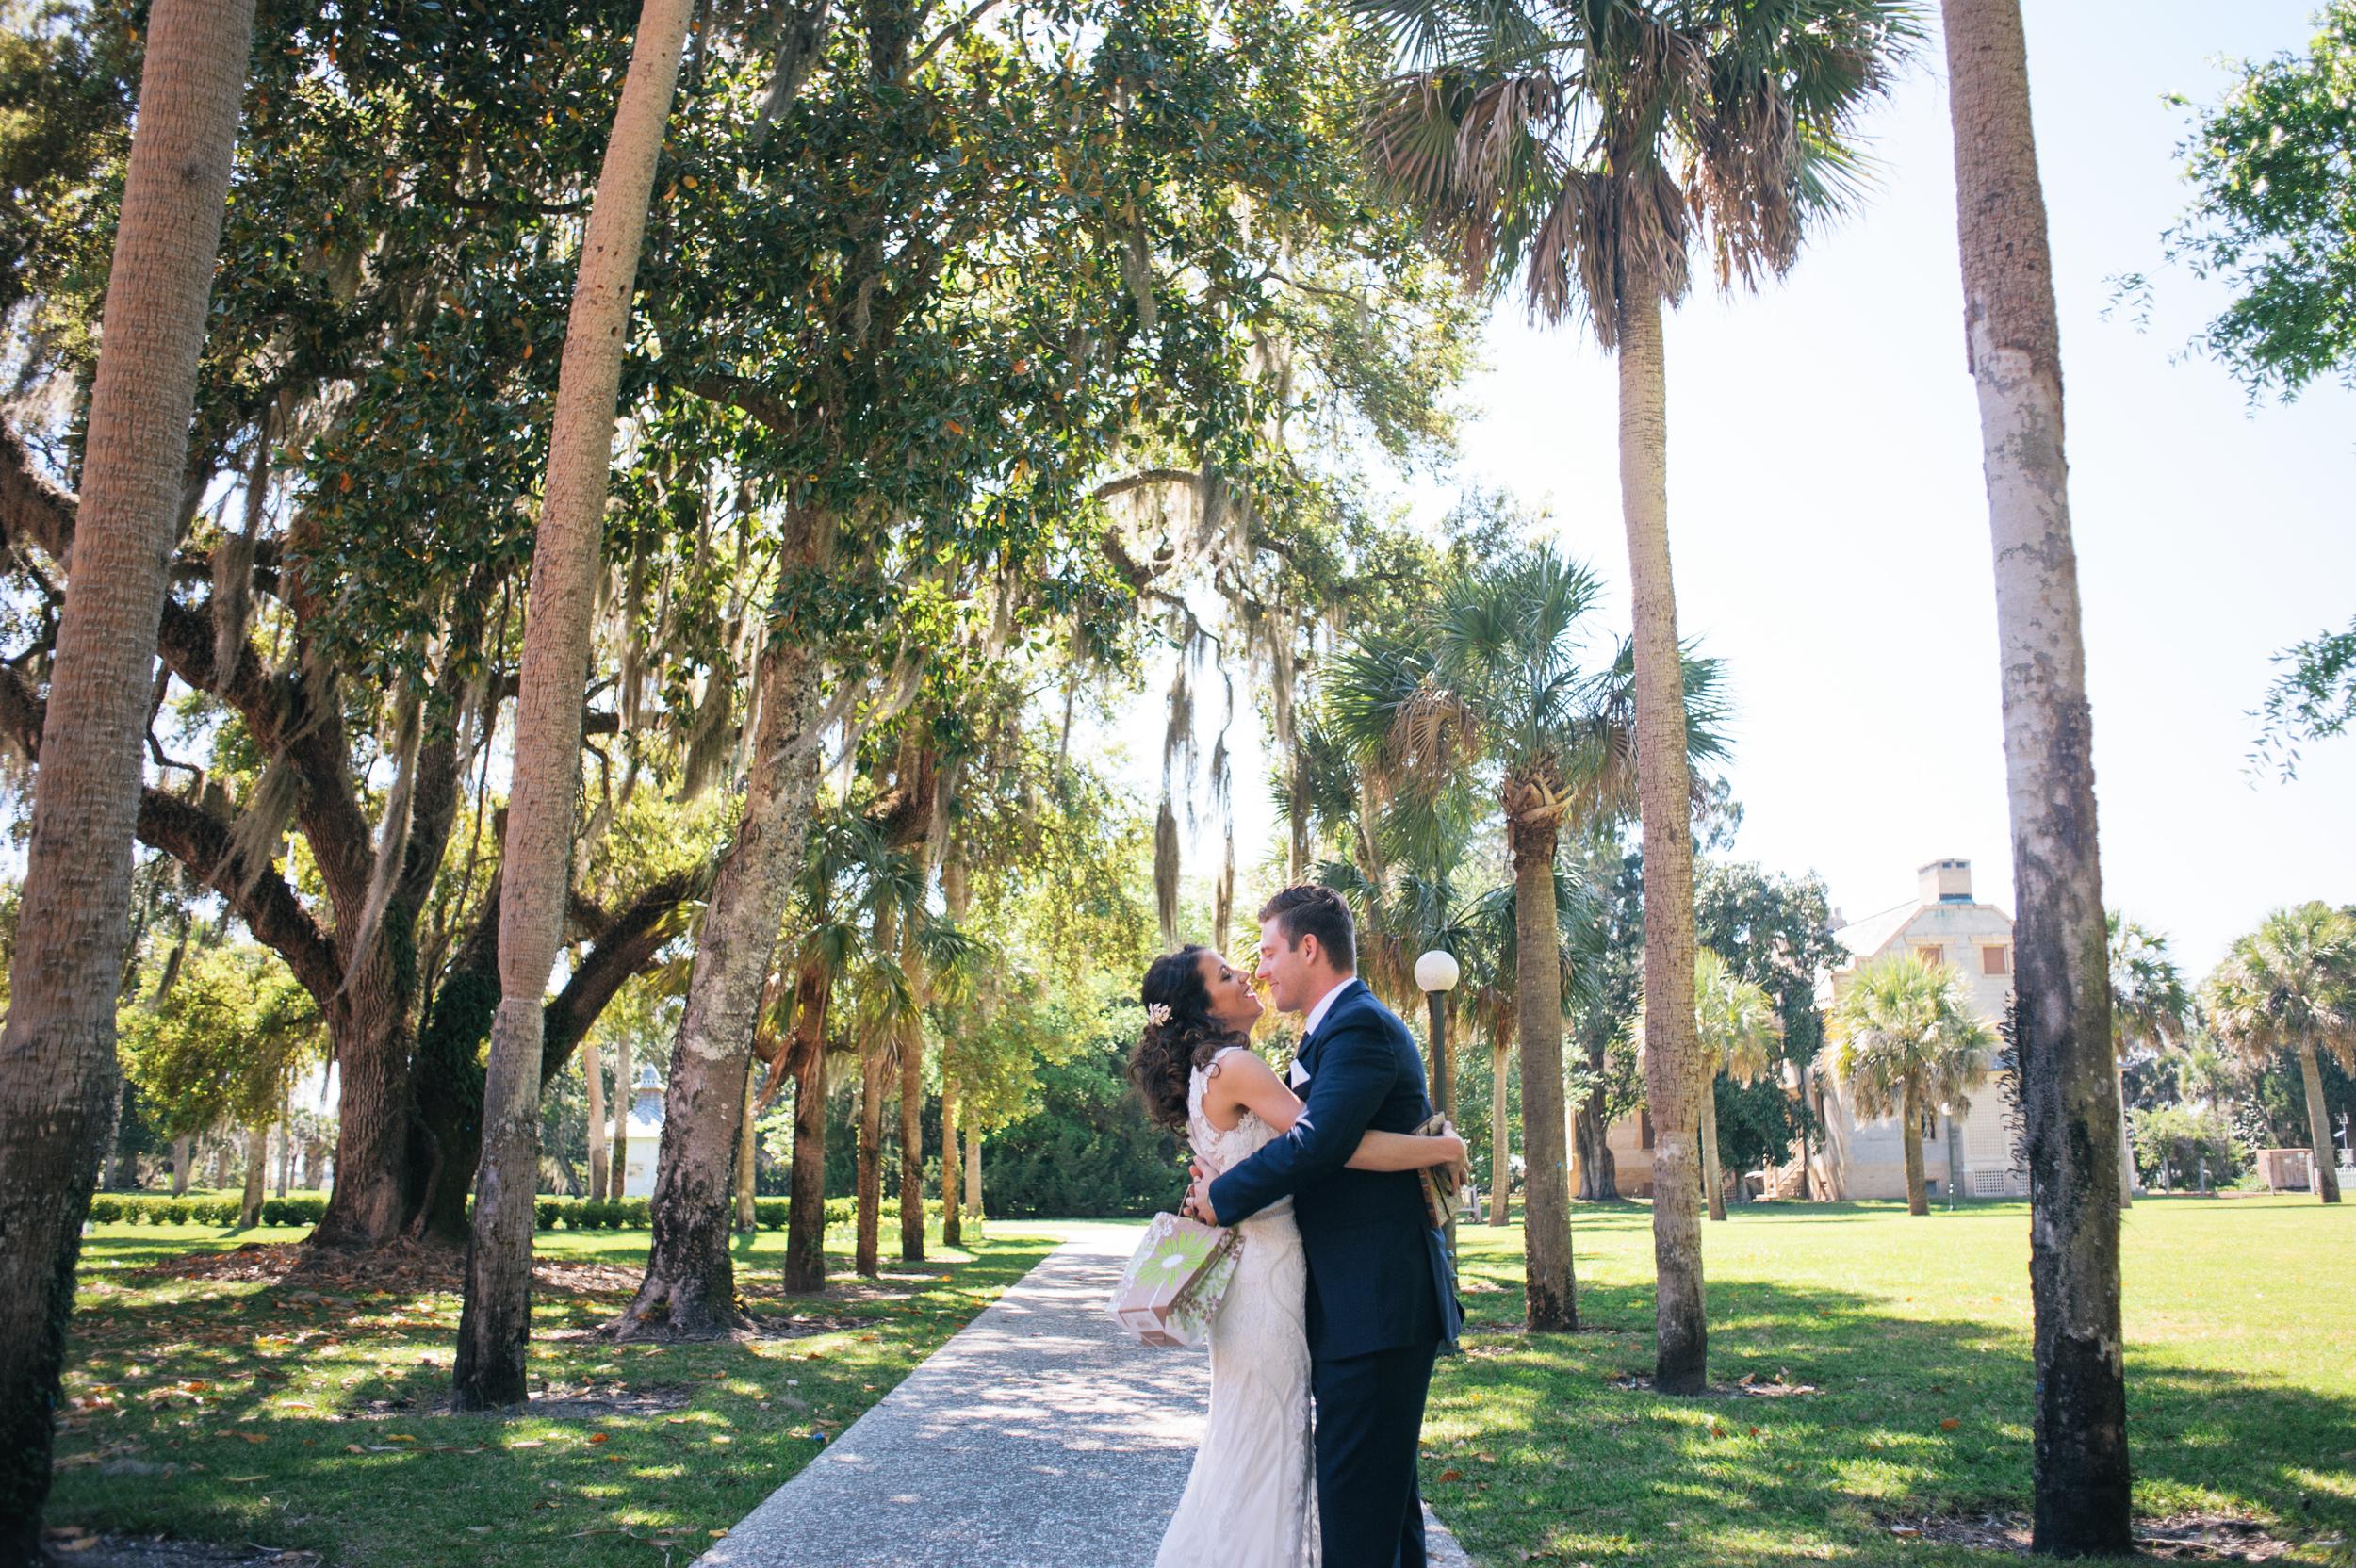 jekyll-island-wedding-photographer-savannah-georgia-wedding-photographer-wedding-photographers-on-jekyll-island-georgia